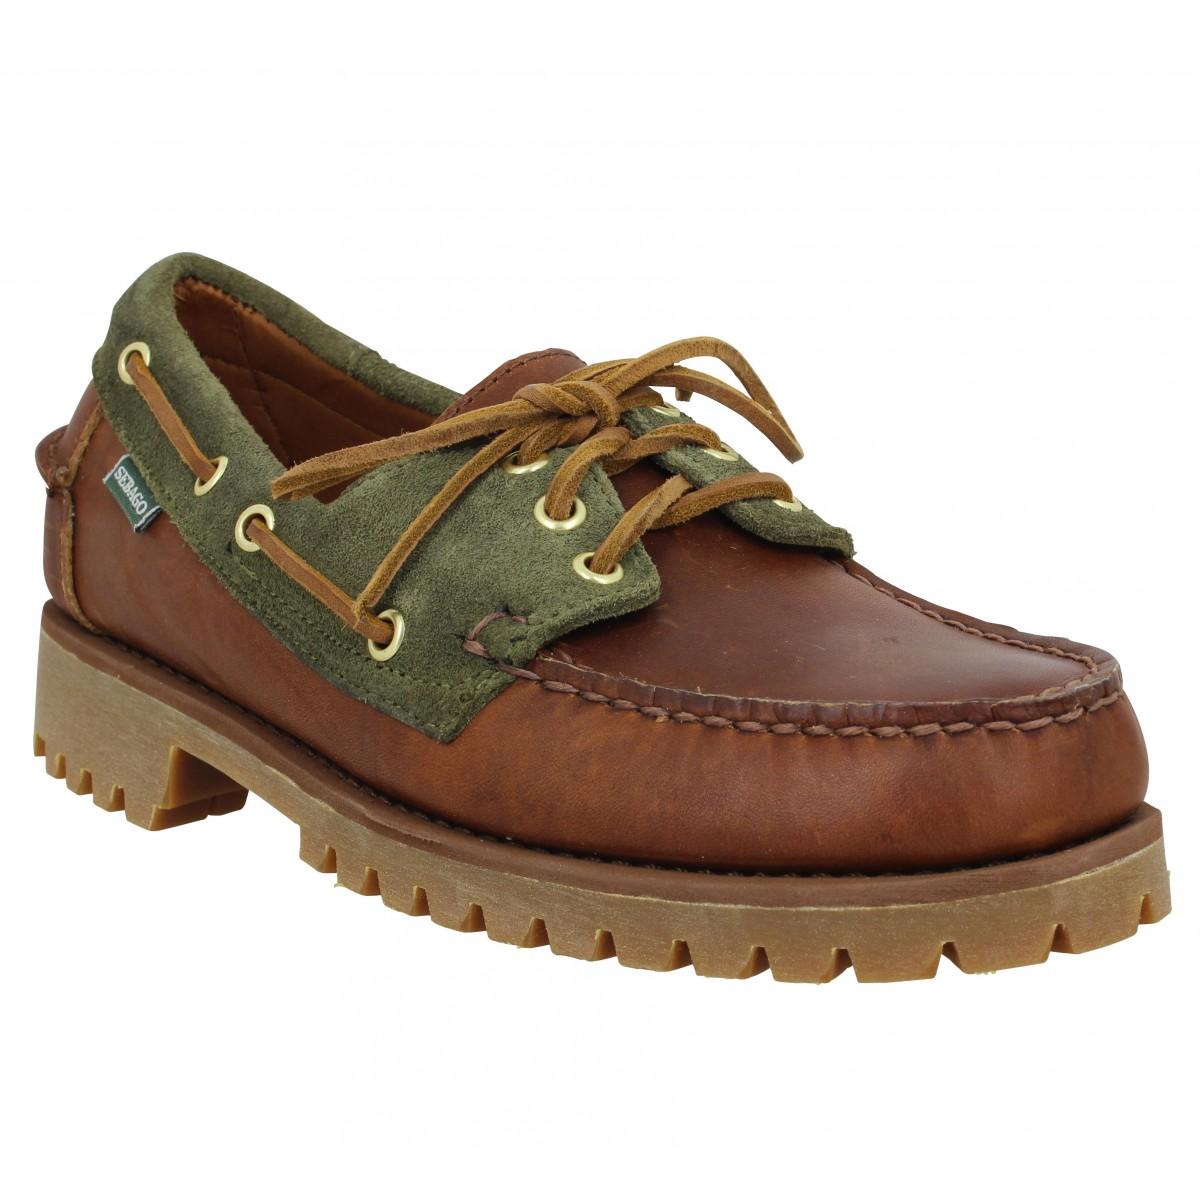 Chaussures bateaux SEBAGO Trickey Lug cuir velours Homme Cognac Green